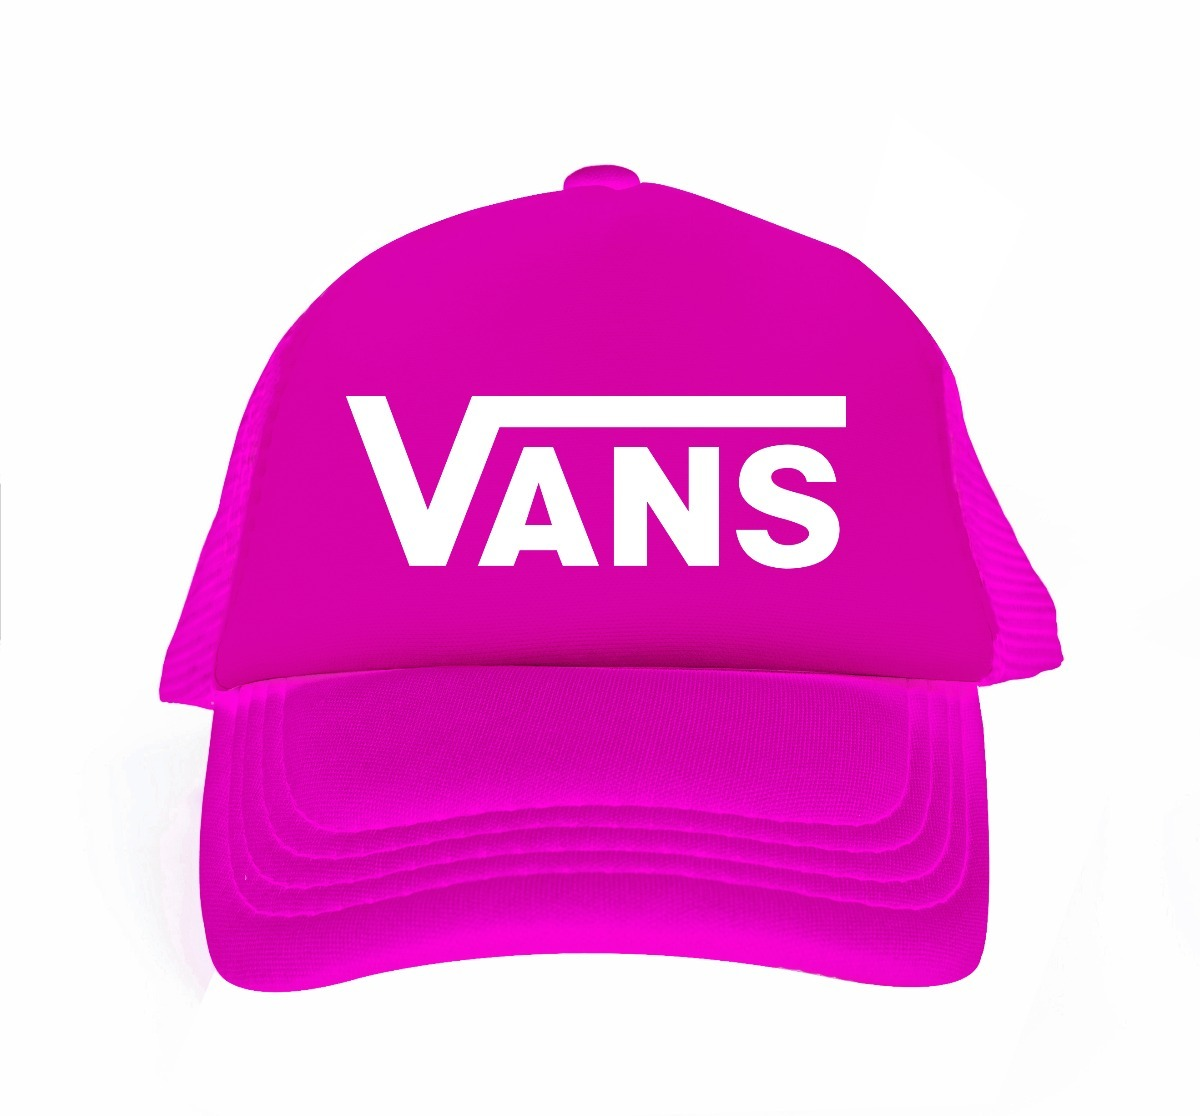 1f41dface15c8 gorra vans skate moda mujer rosa-morado-negra envío gratis. Cargando zoom.